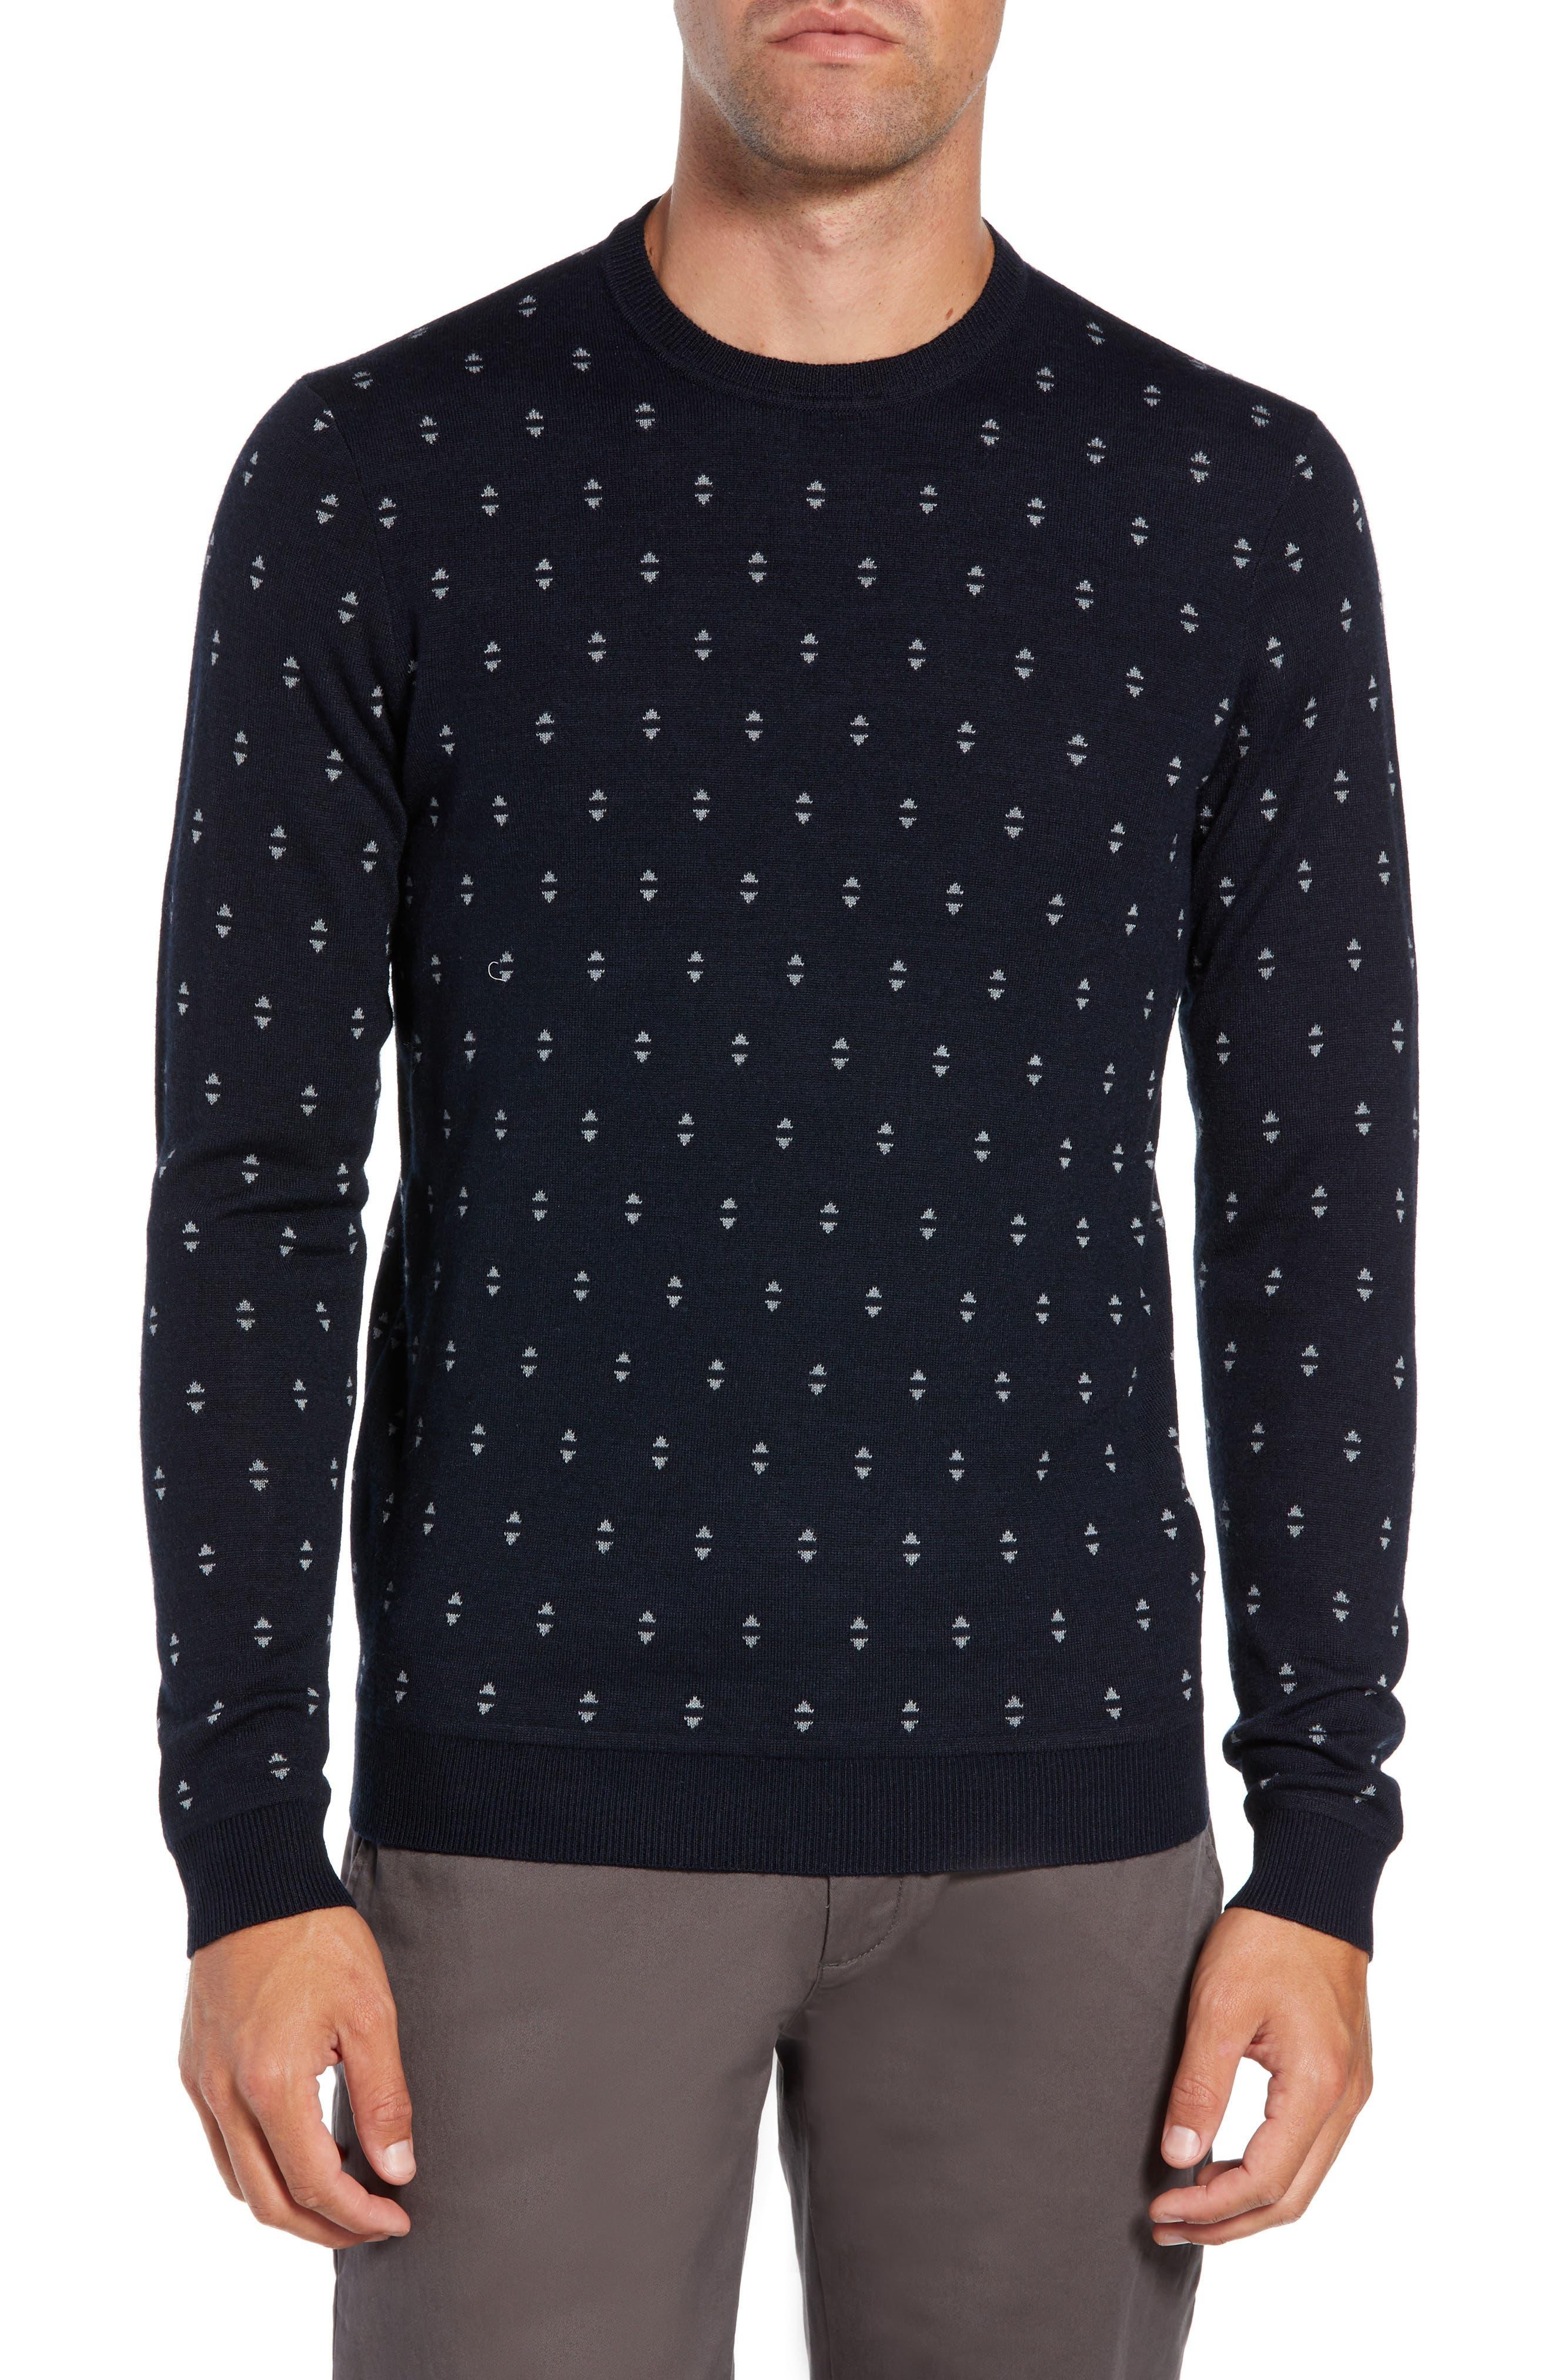 Talkoo Trim Fit Crewneck Sweater,                         Main,                         color, 410